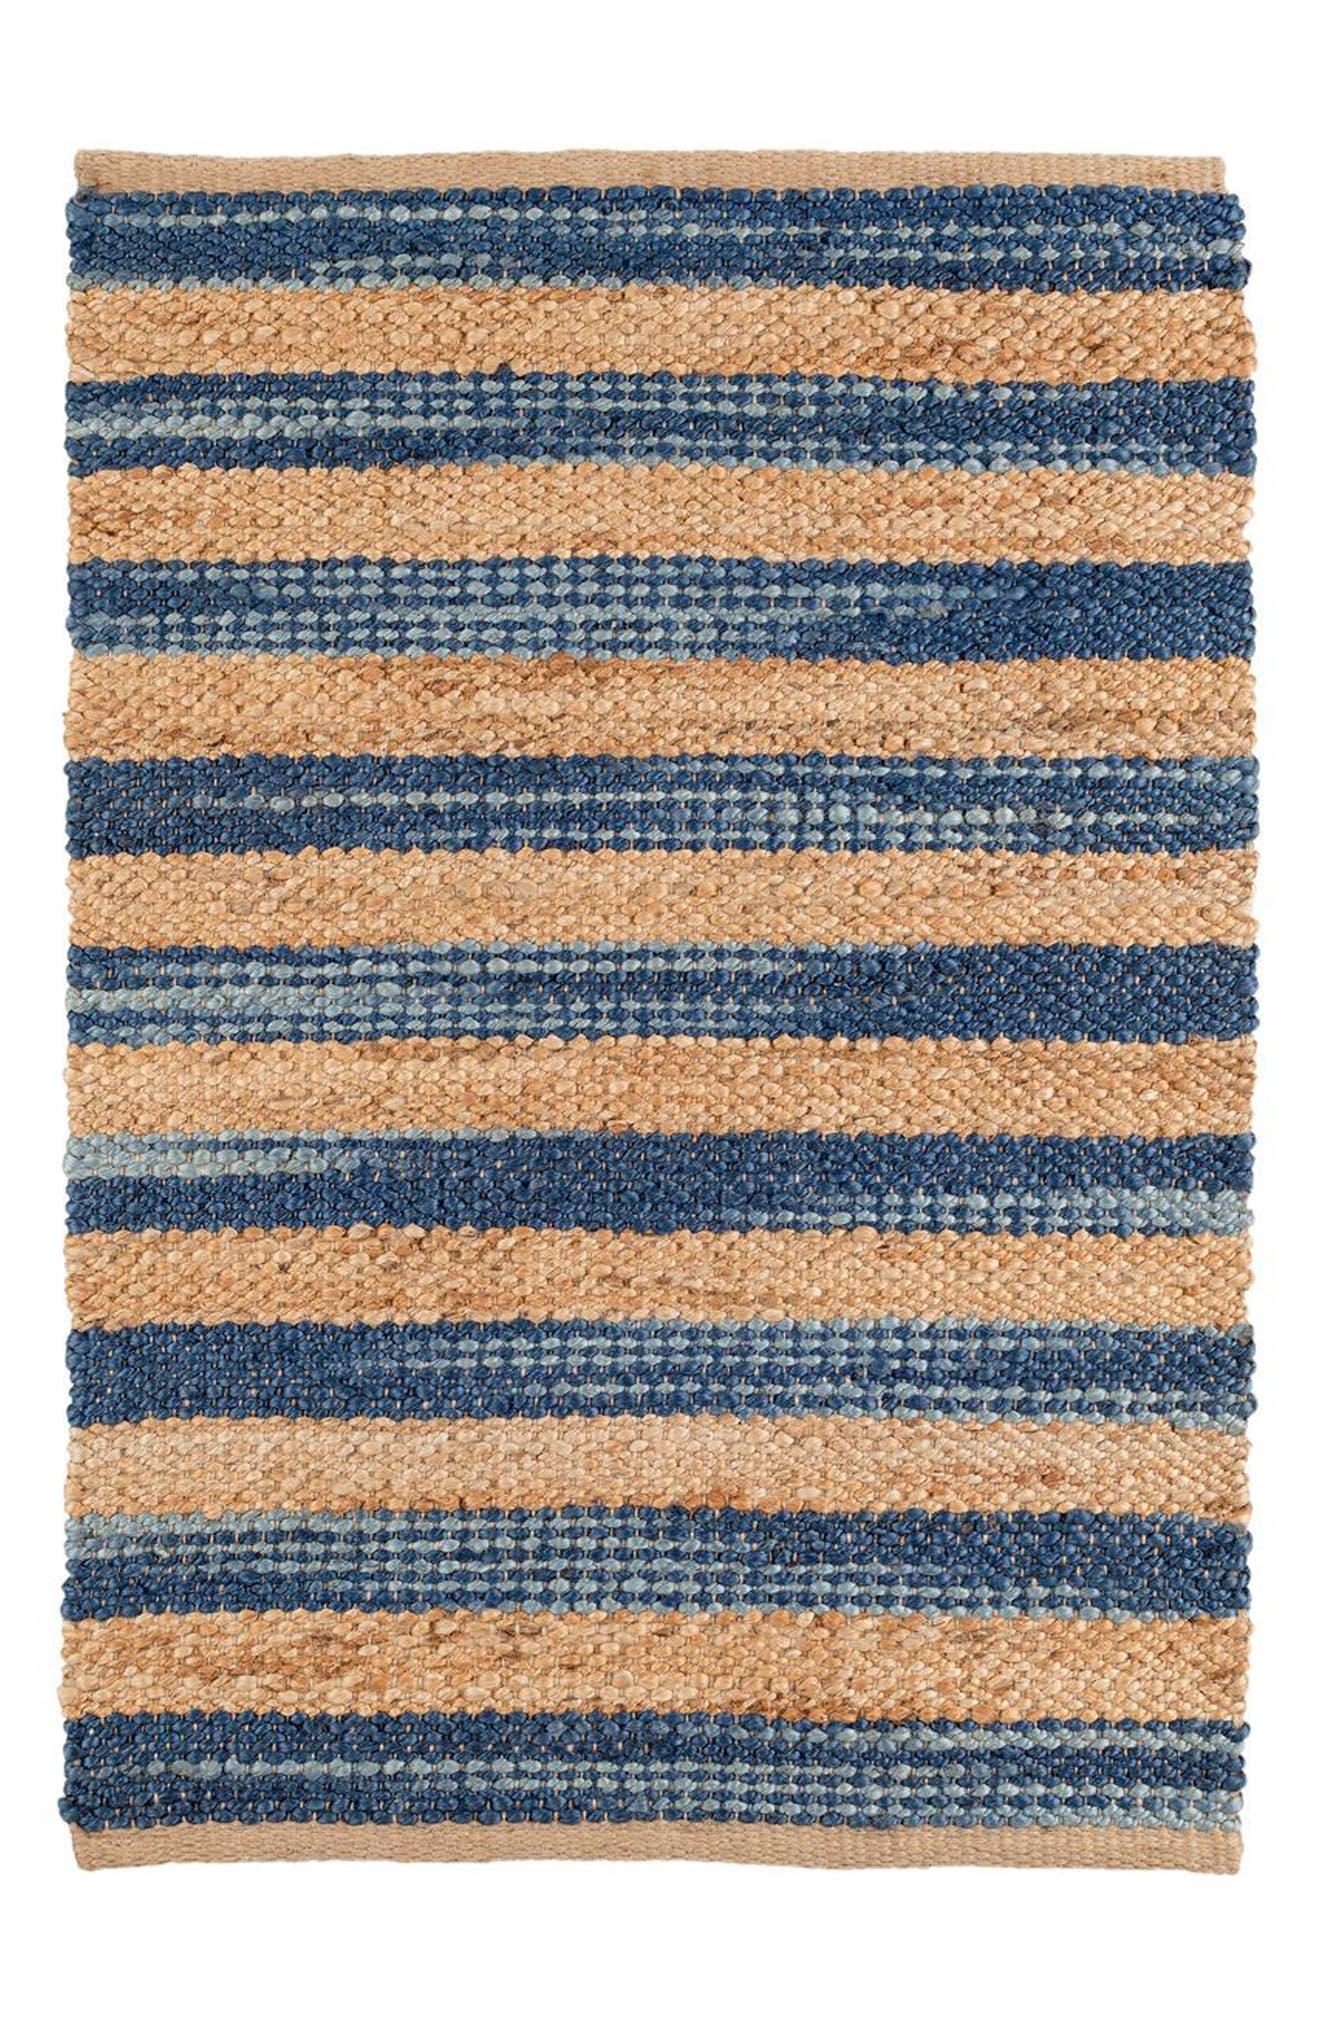 Corfu Blue Jute Rug,                         Main,                         color, Blue